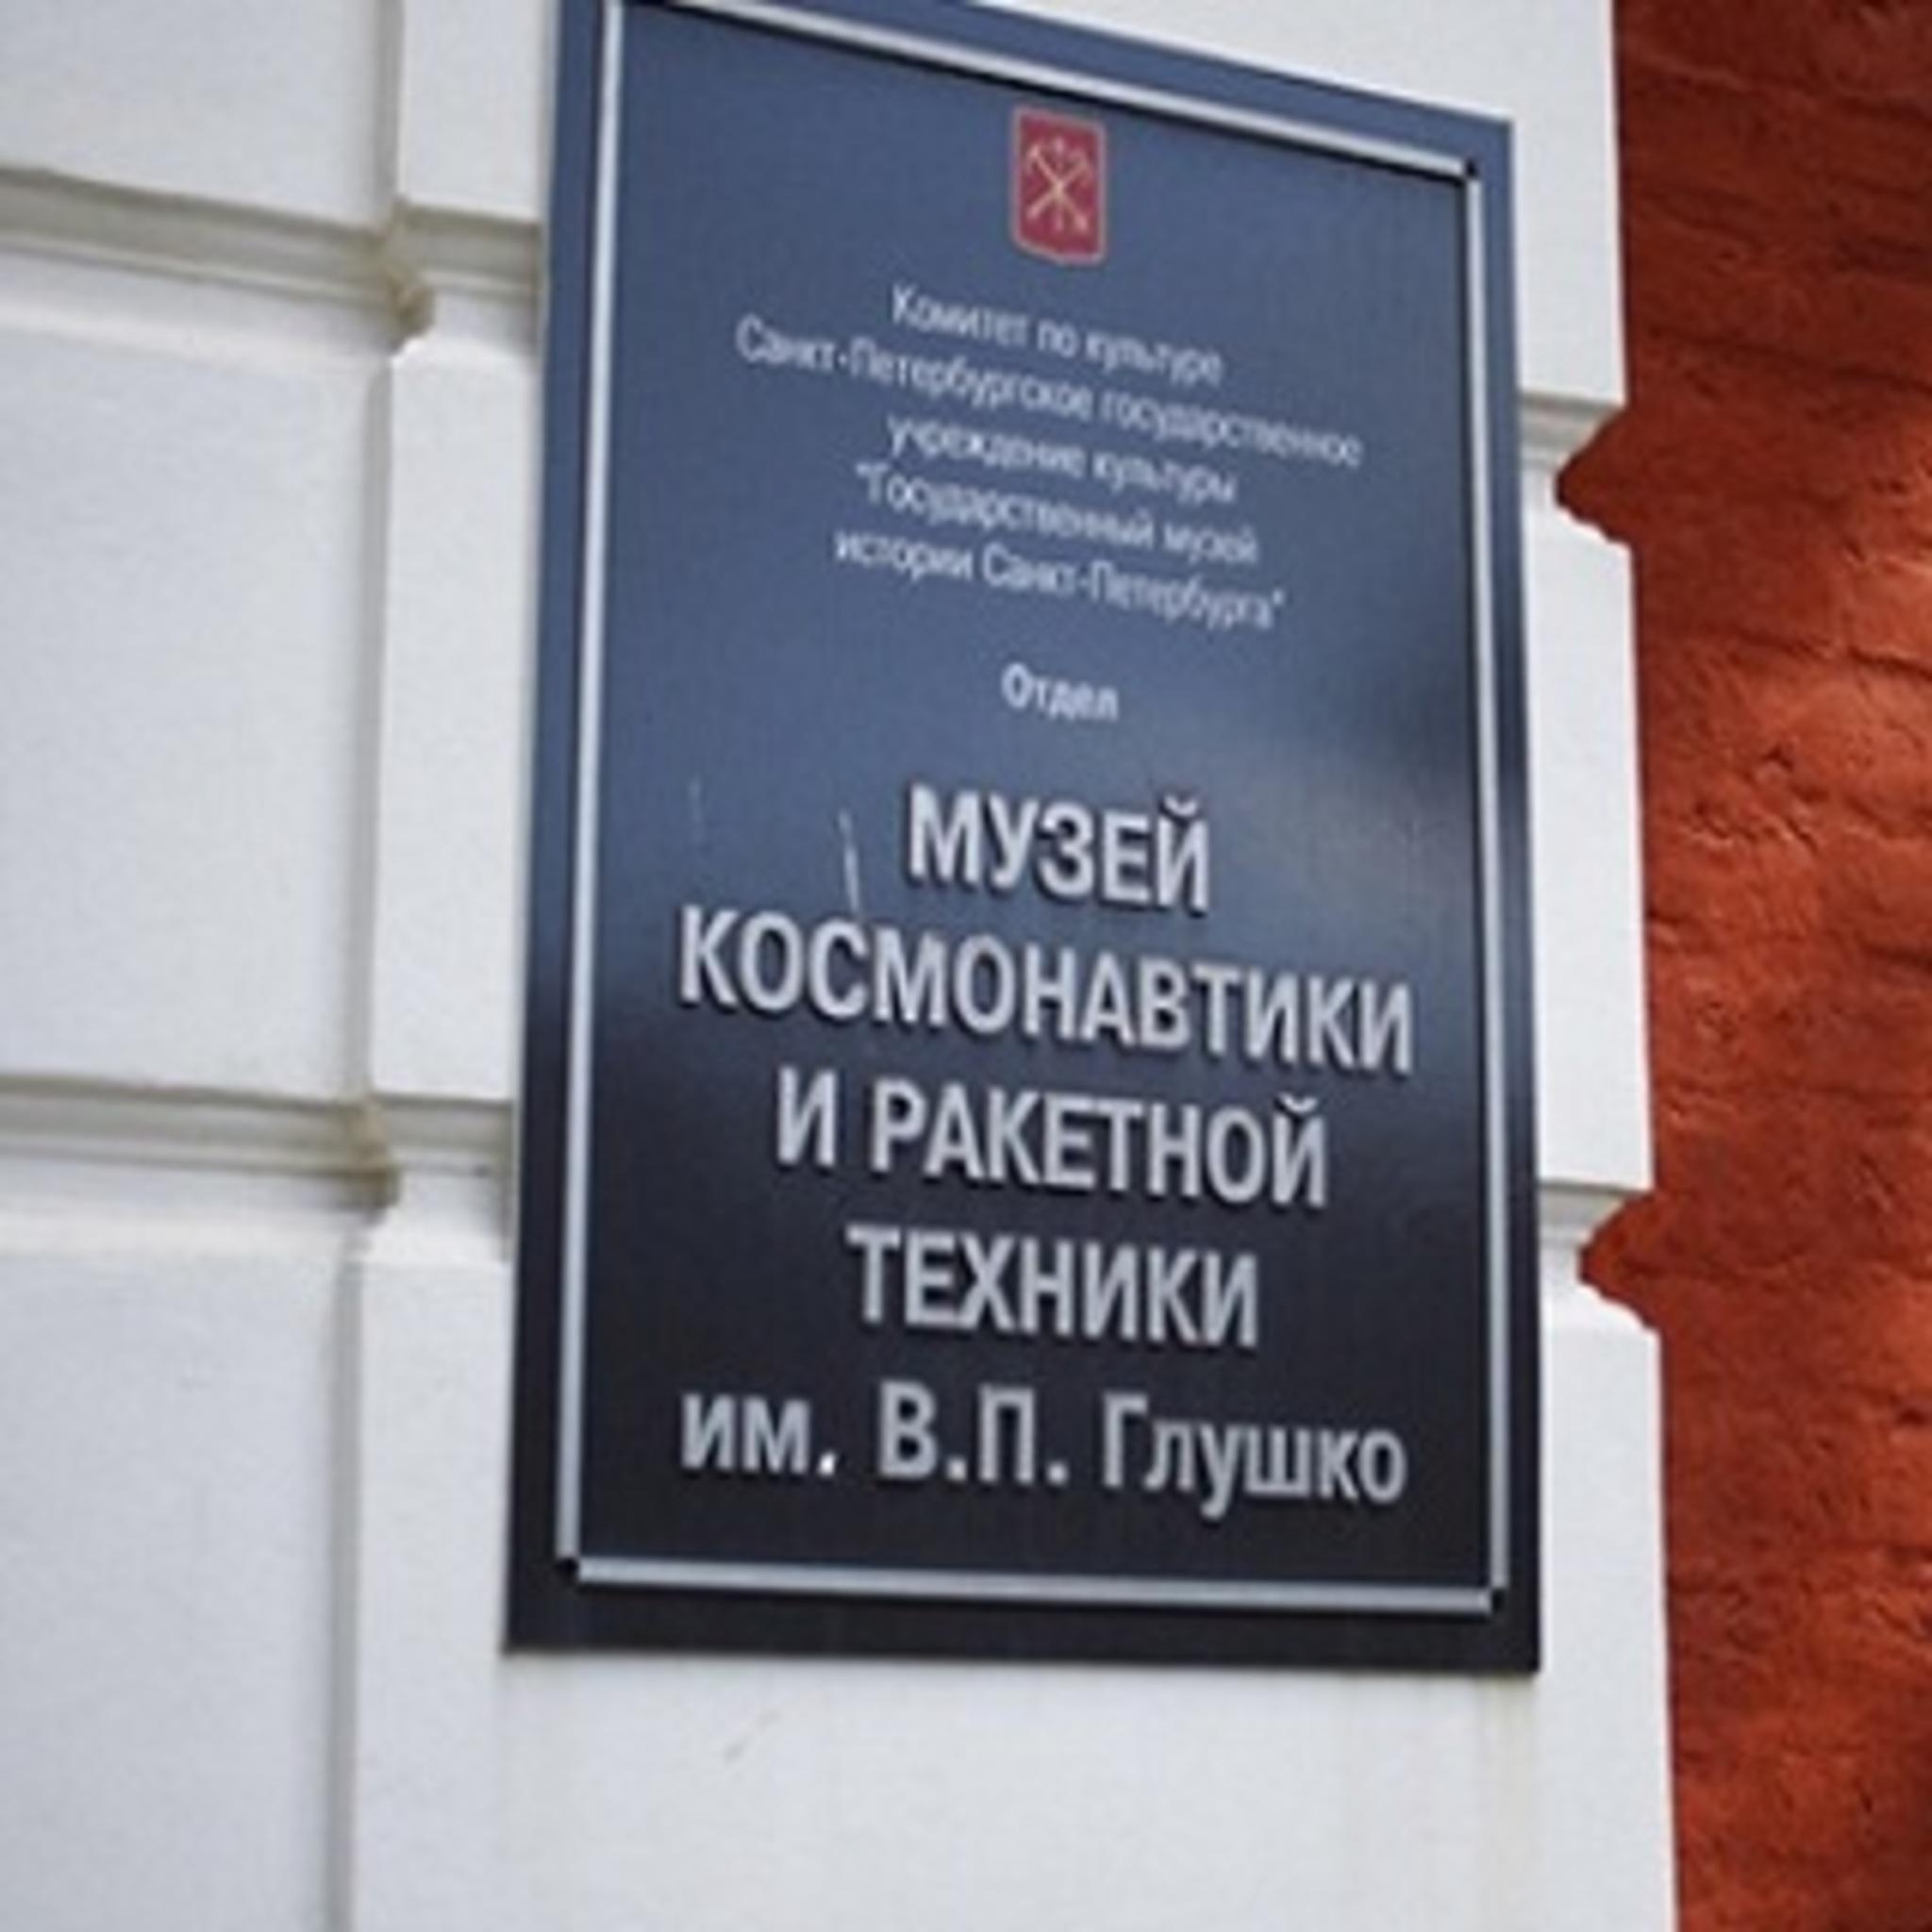 The museum of cosmonautics and rocket engineering named after V. P. Glushko